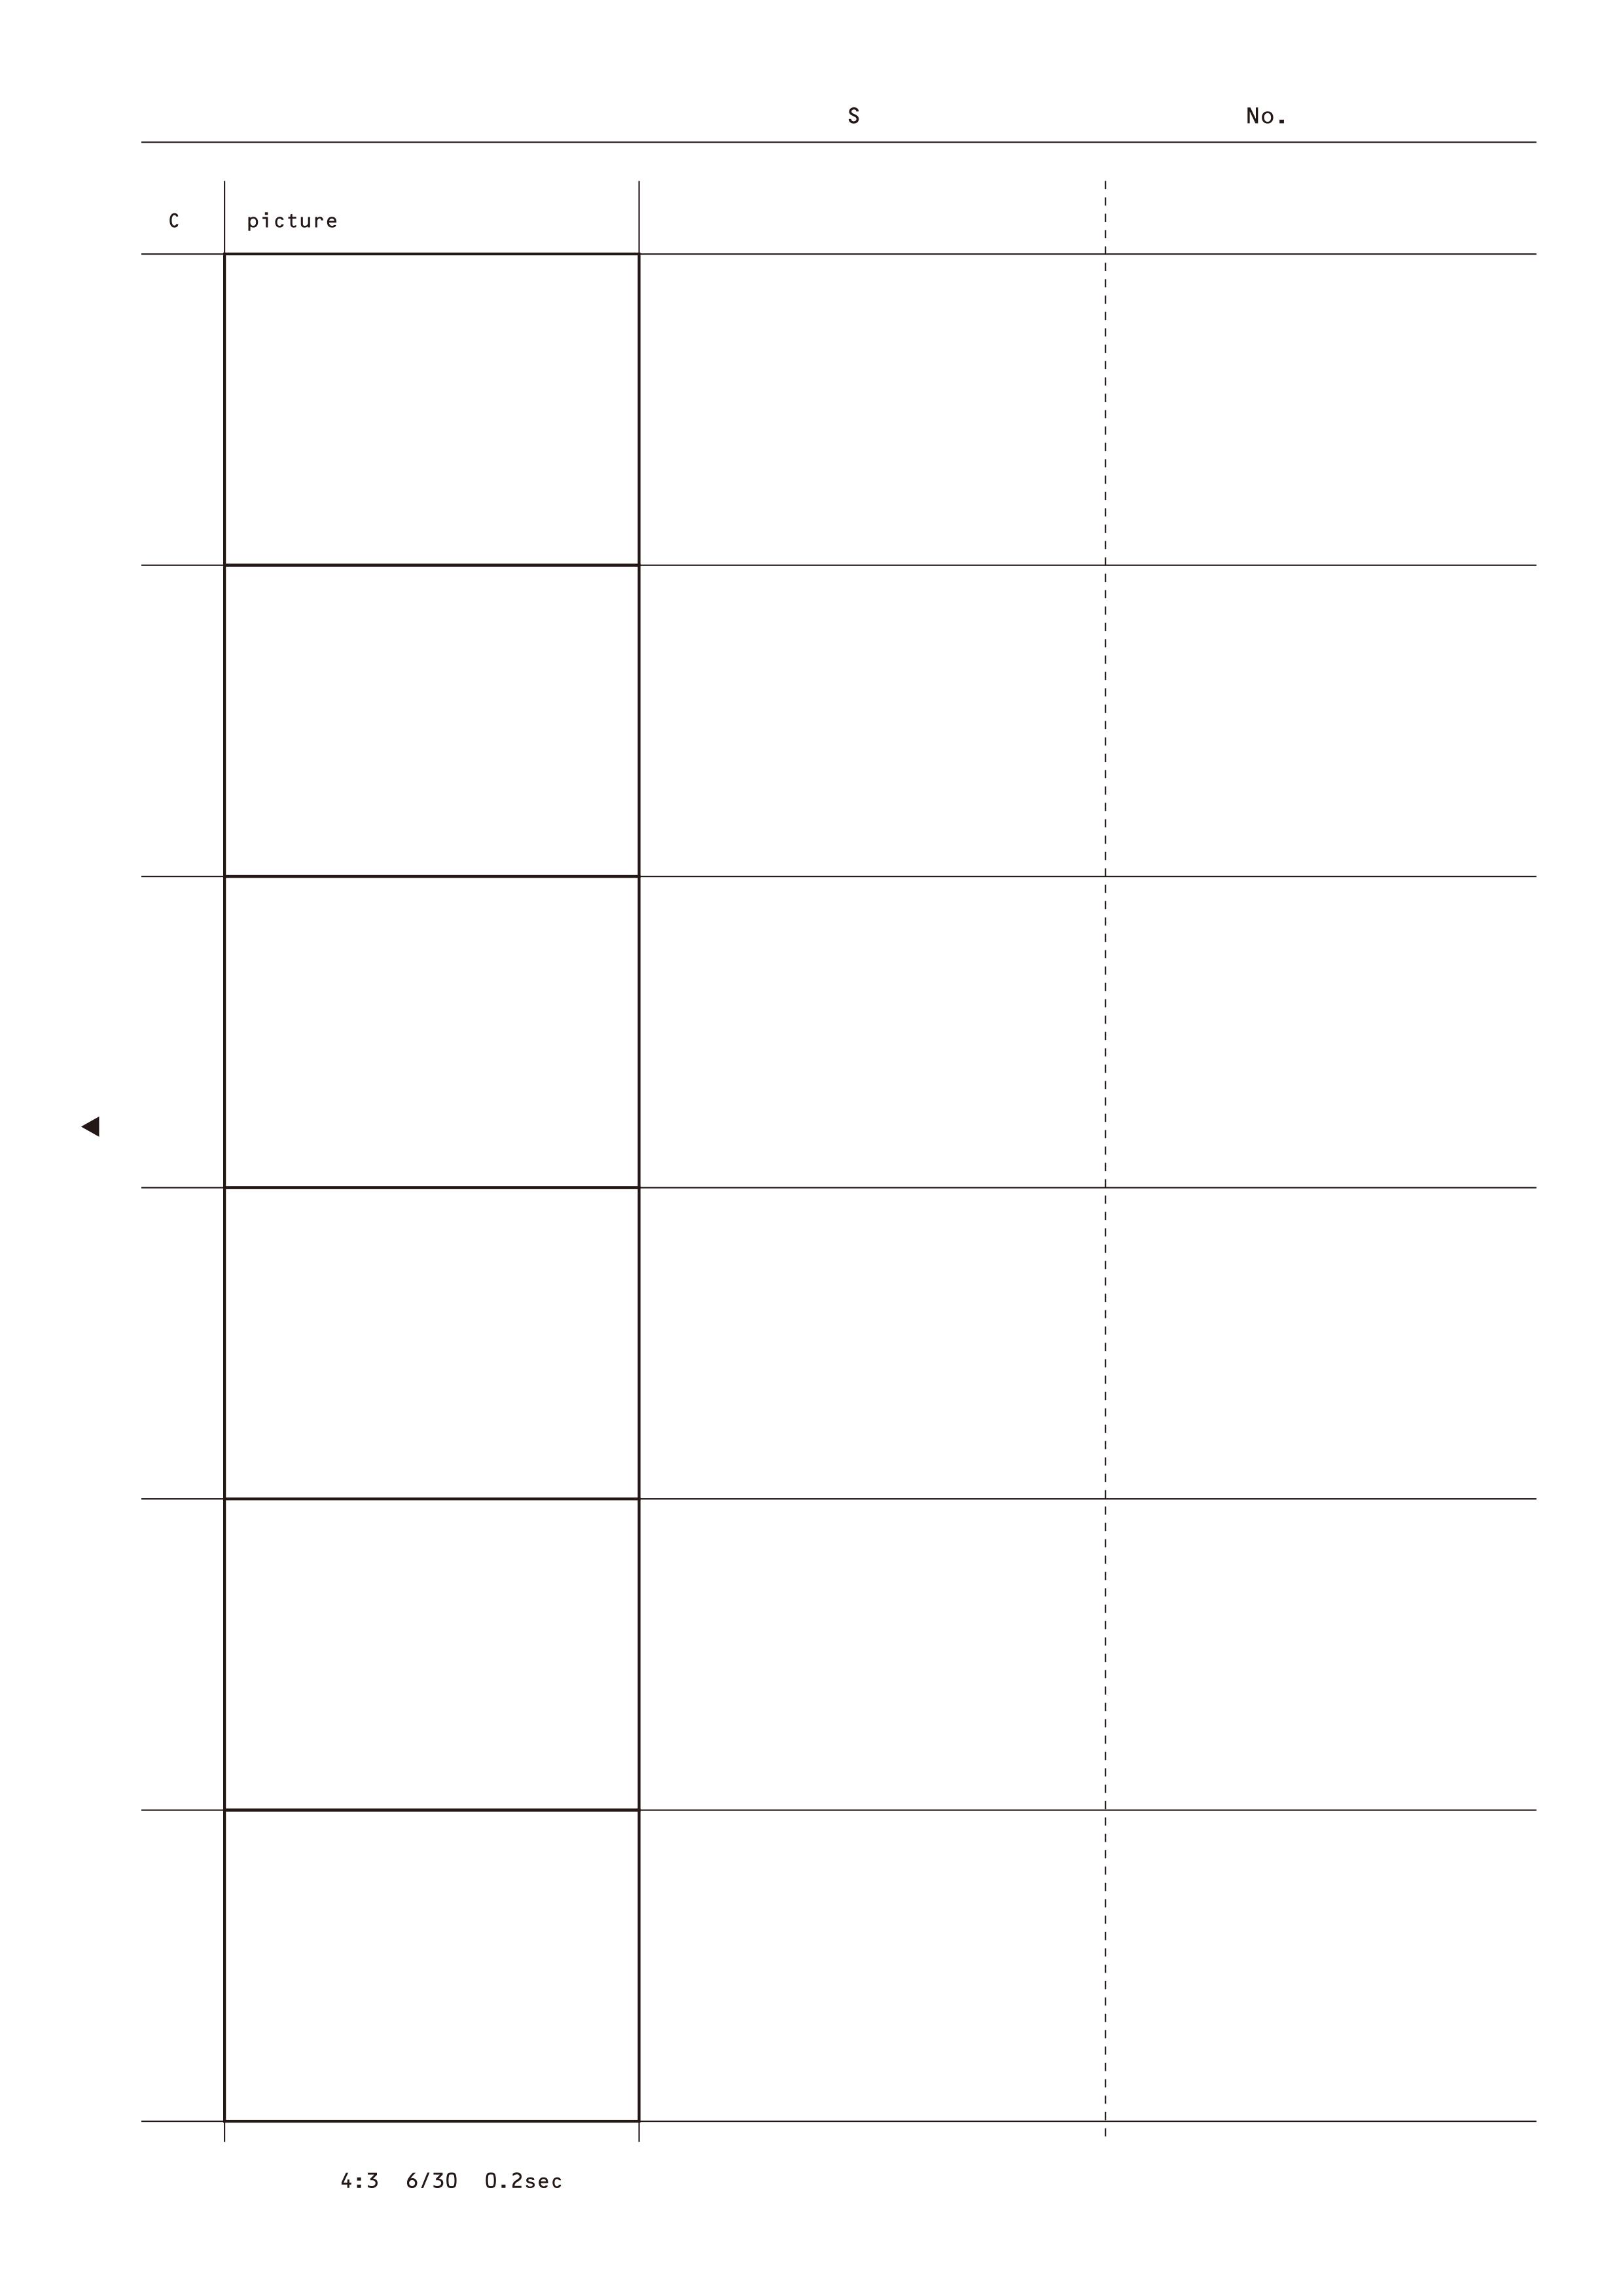 story board sheets    u7d75 u30b3 u30f3 u30c6 u7528 u7d19  uff08 u30c0 u30a6 u30f3 u30ed u30fc u30c9 u81ea u7531 uff09  u7d75 u30b3 u30f3 u30c6 u306e u66f8 u304d u65b910 u306e u30dd u30a4 u30f3 u30c8